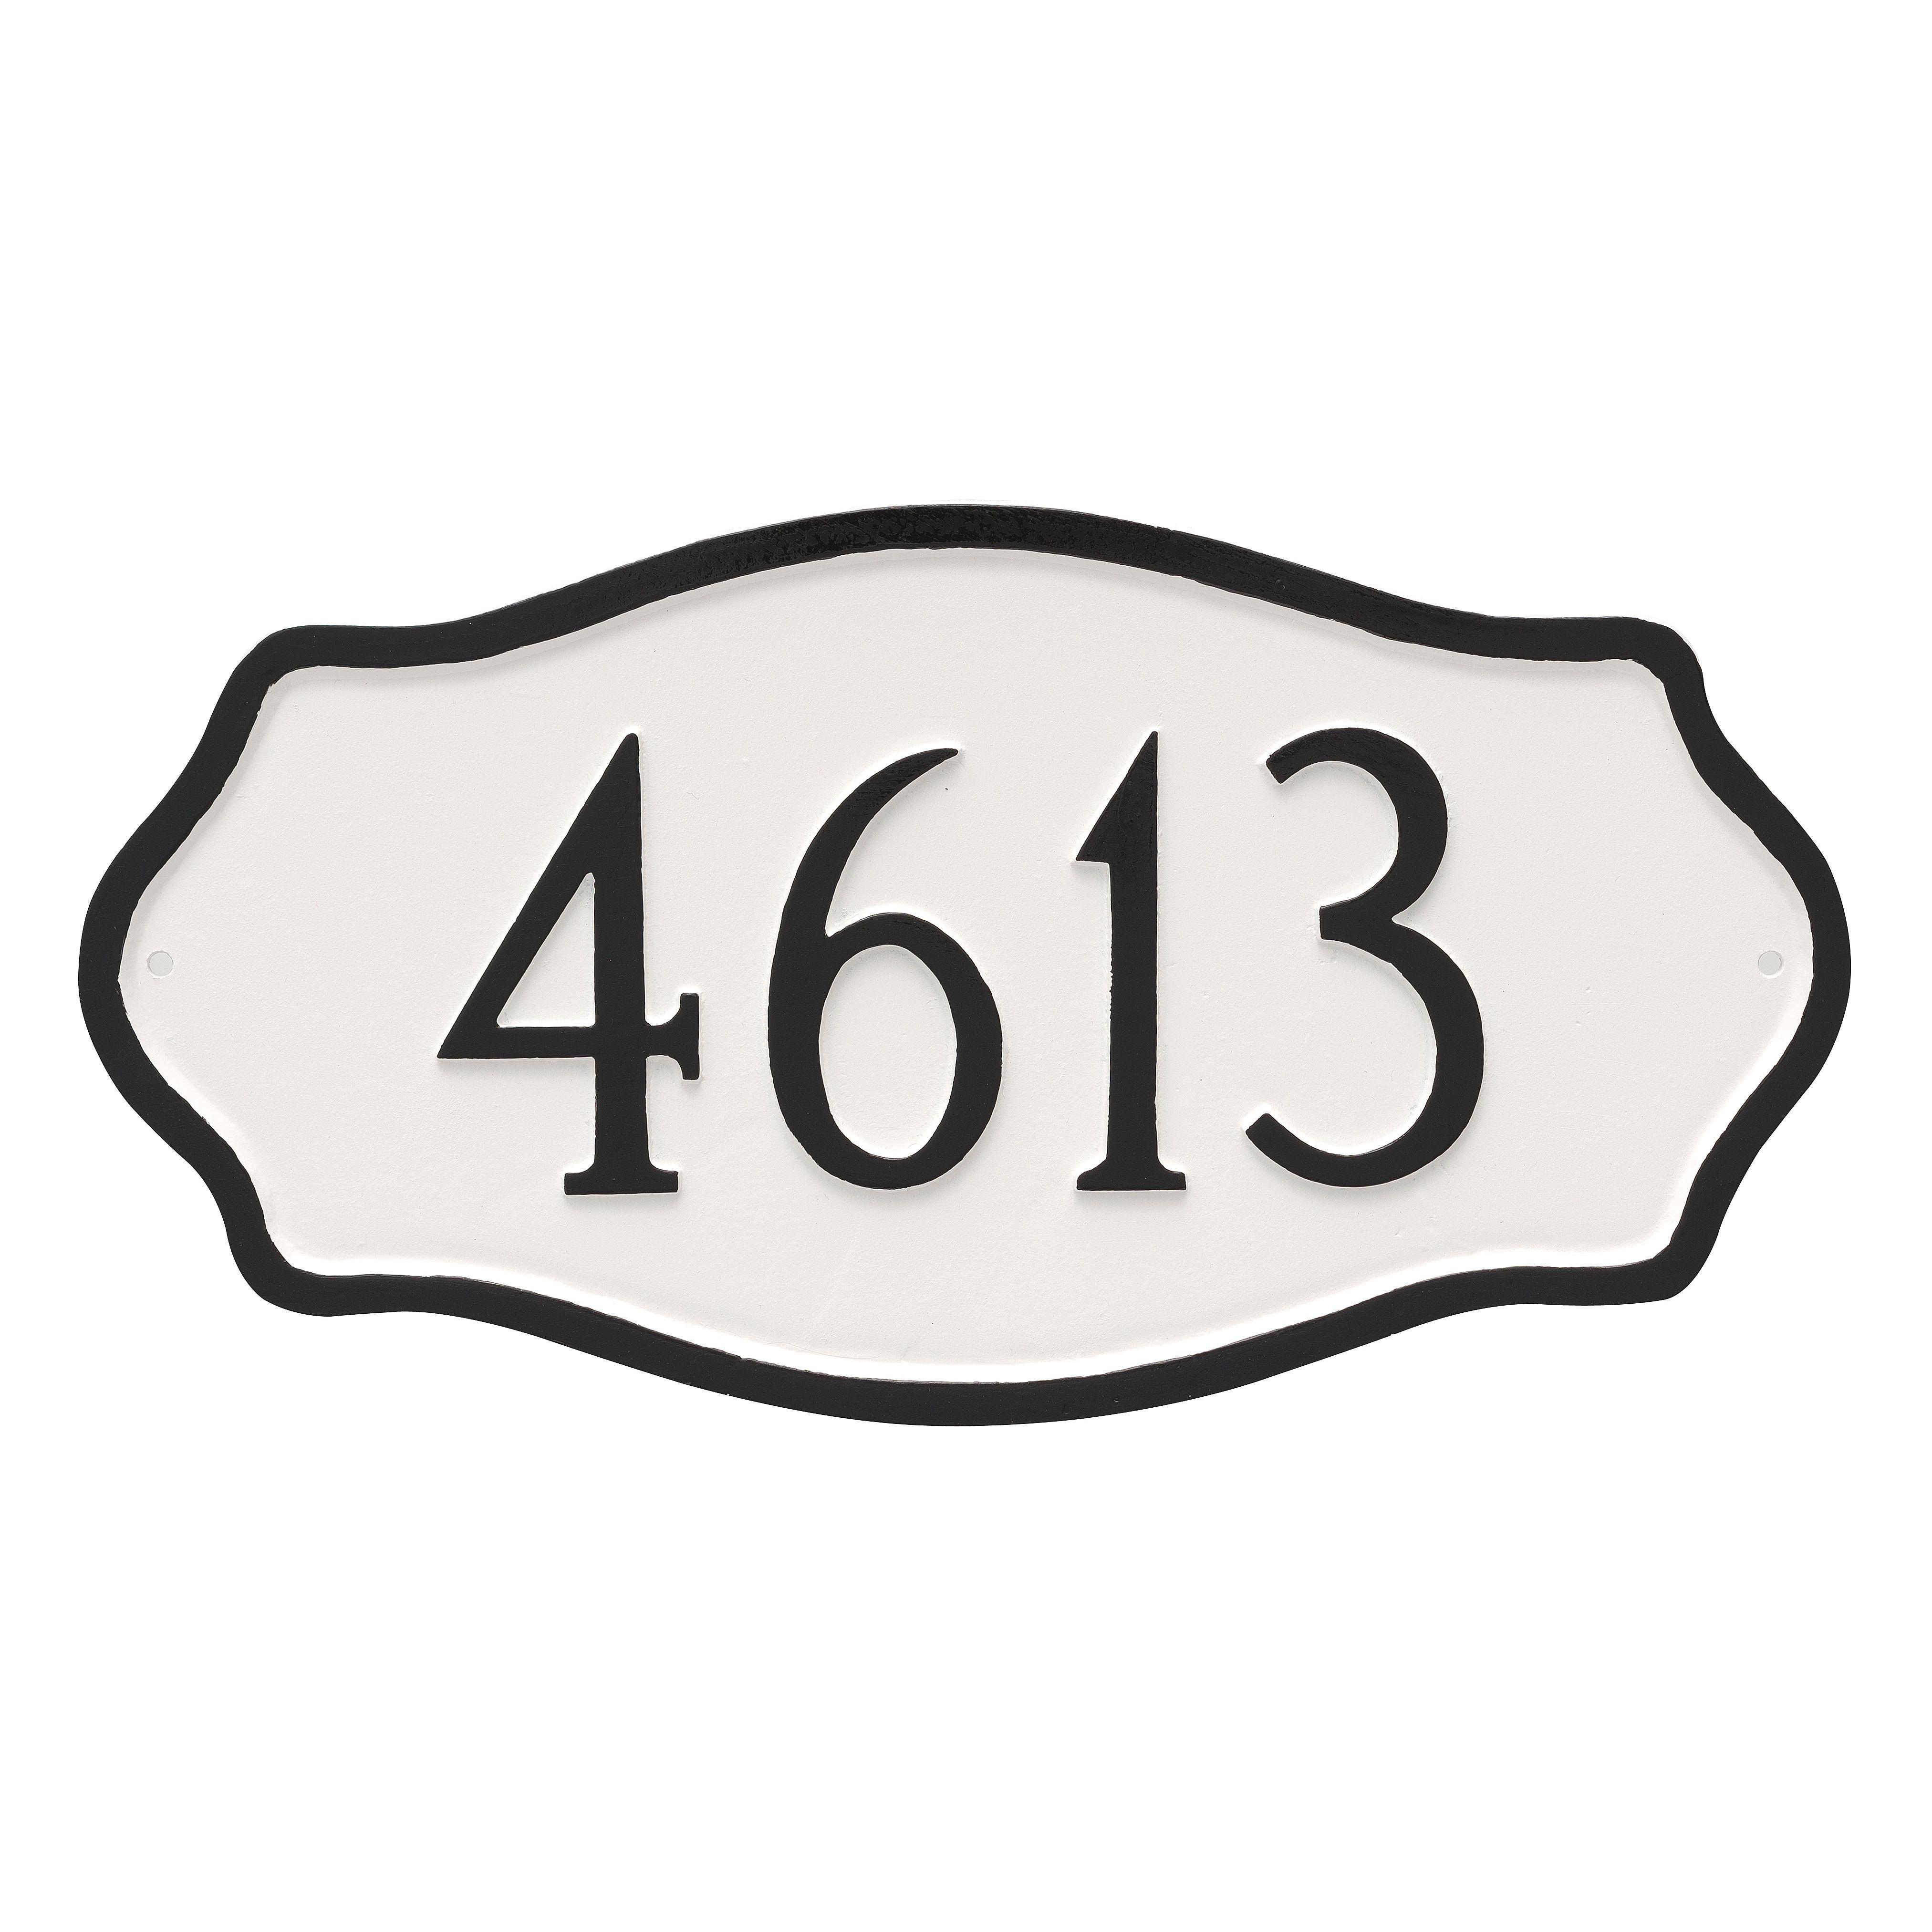 Hamilton 1Line Wall Address Plaque Address plaque